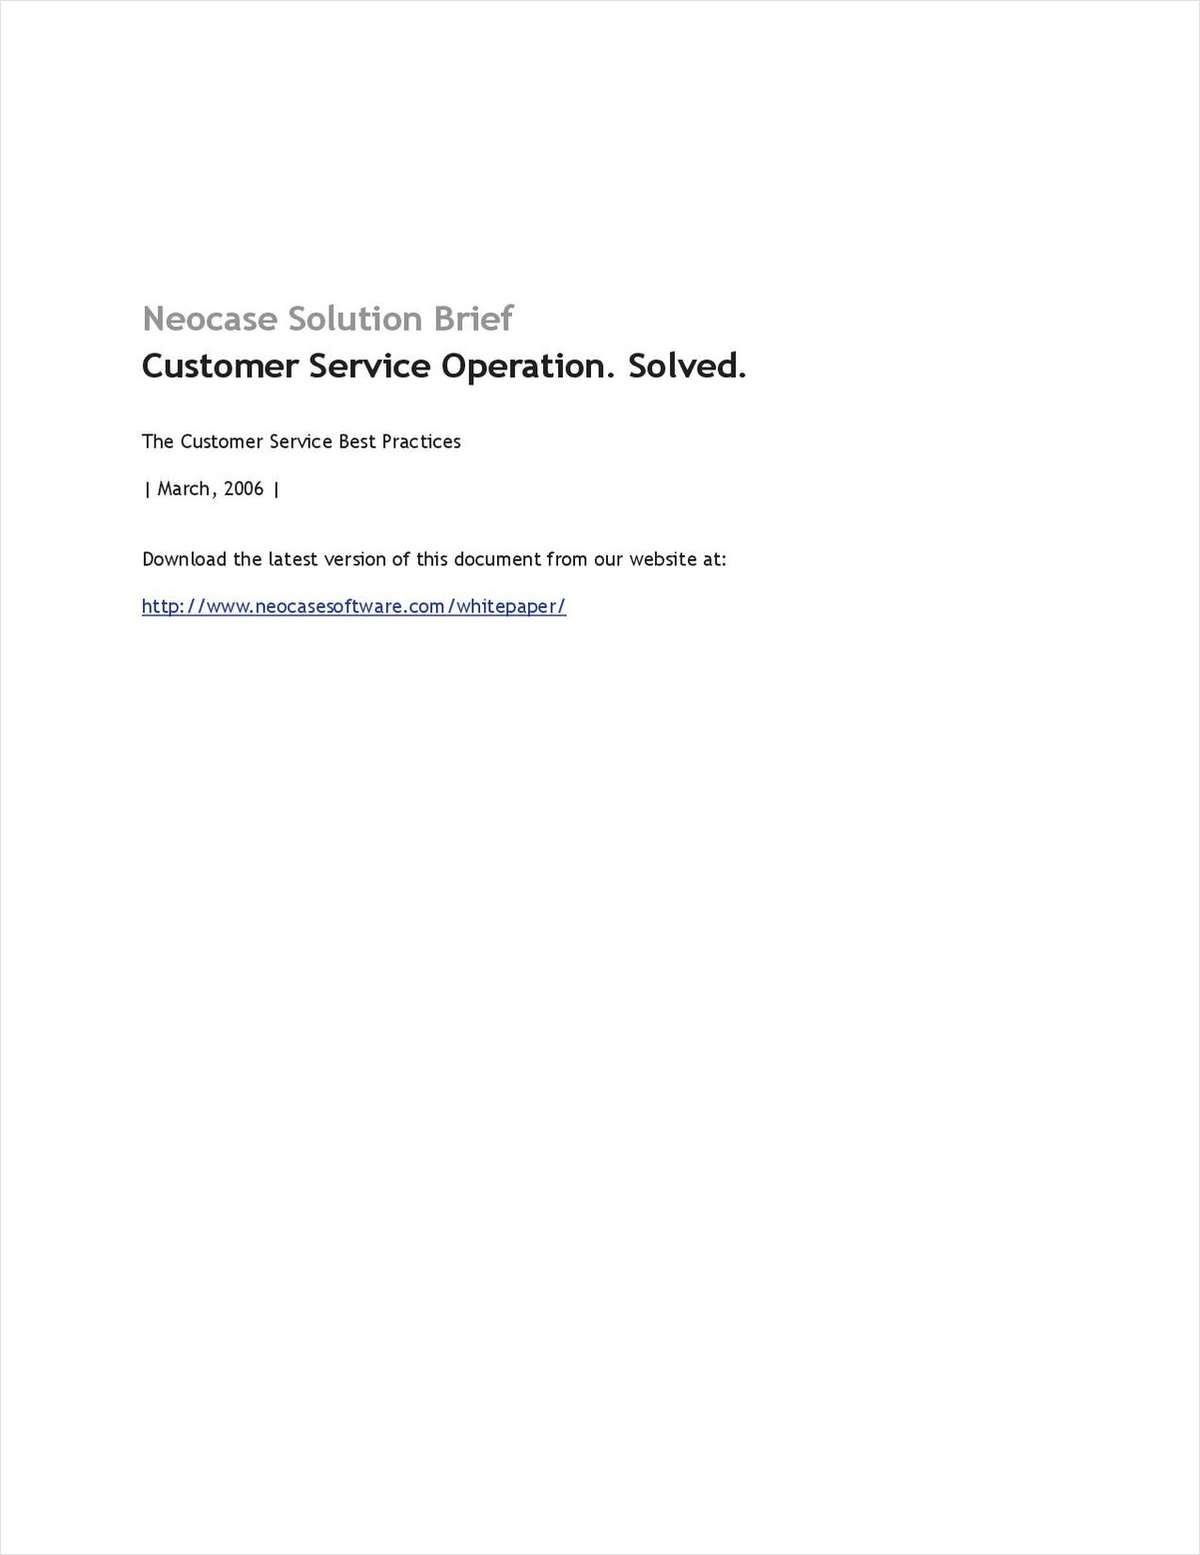 Neocase's Customer Service Best Practices